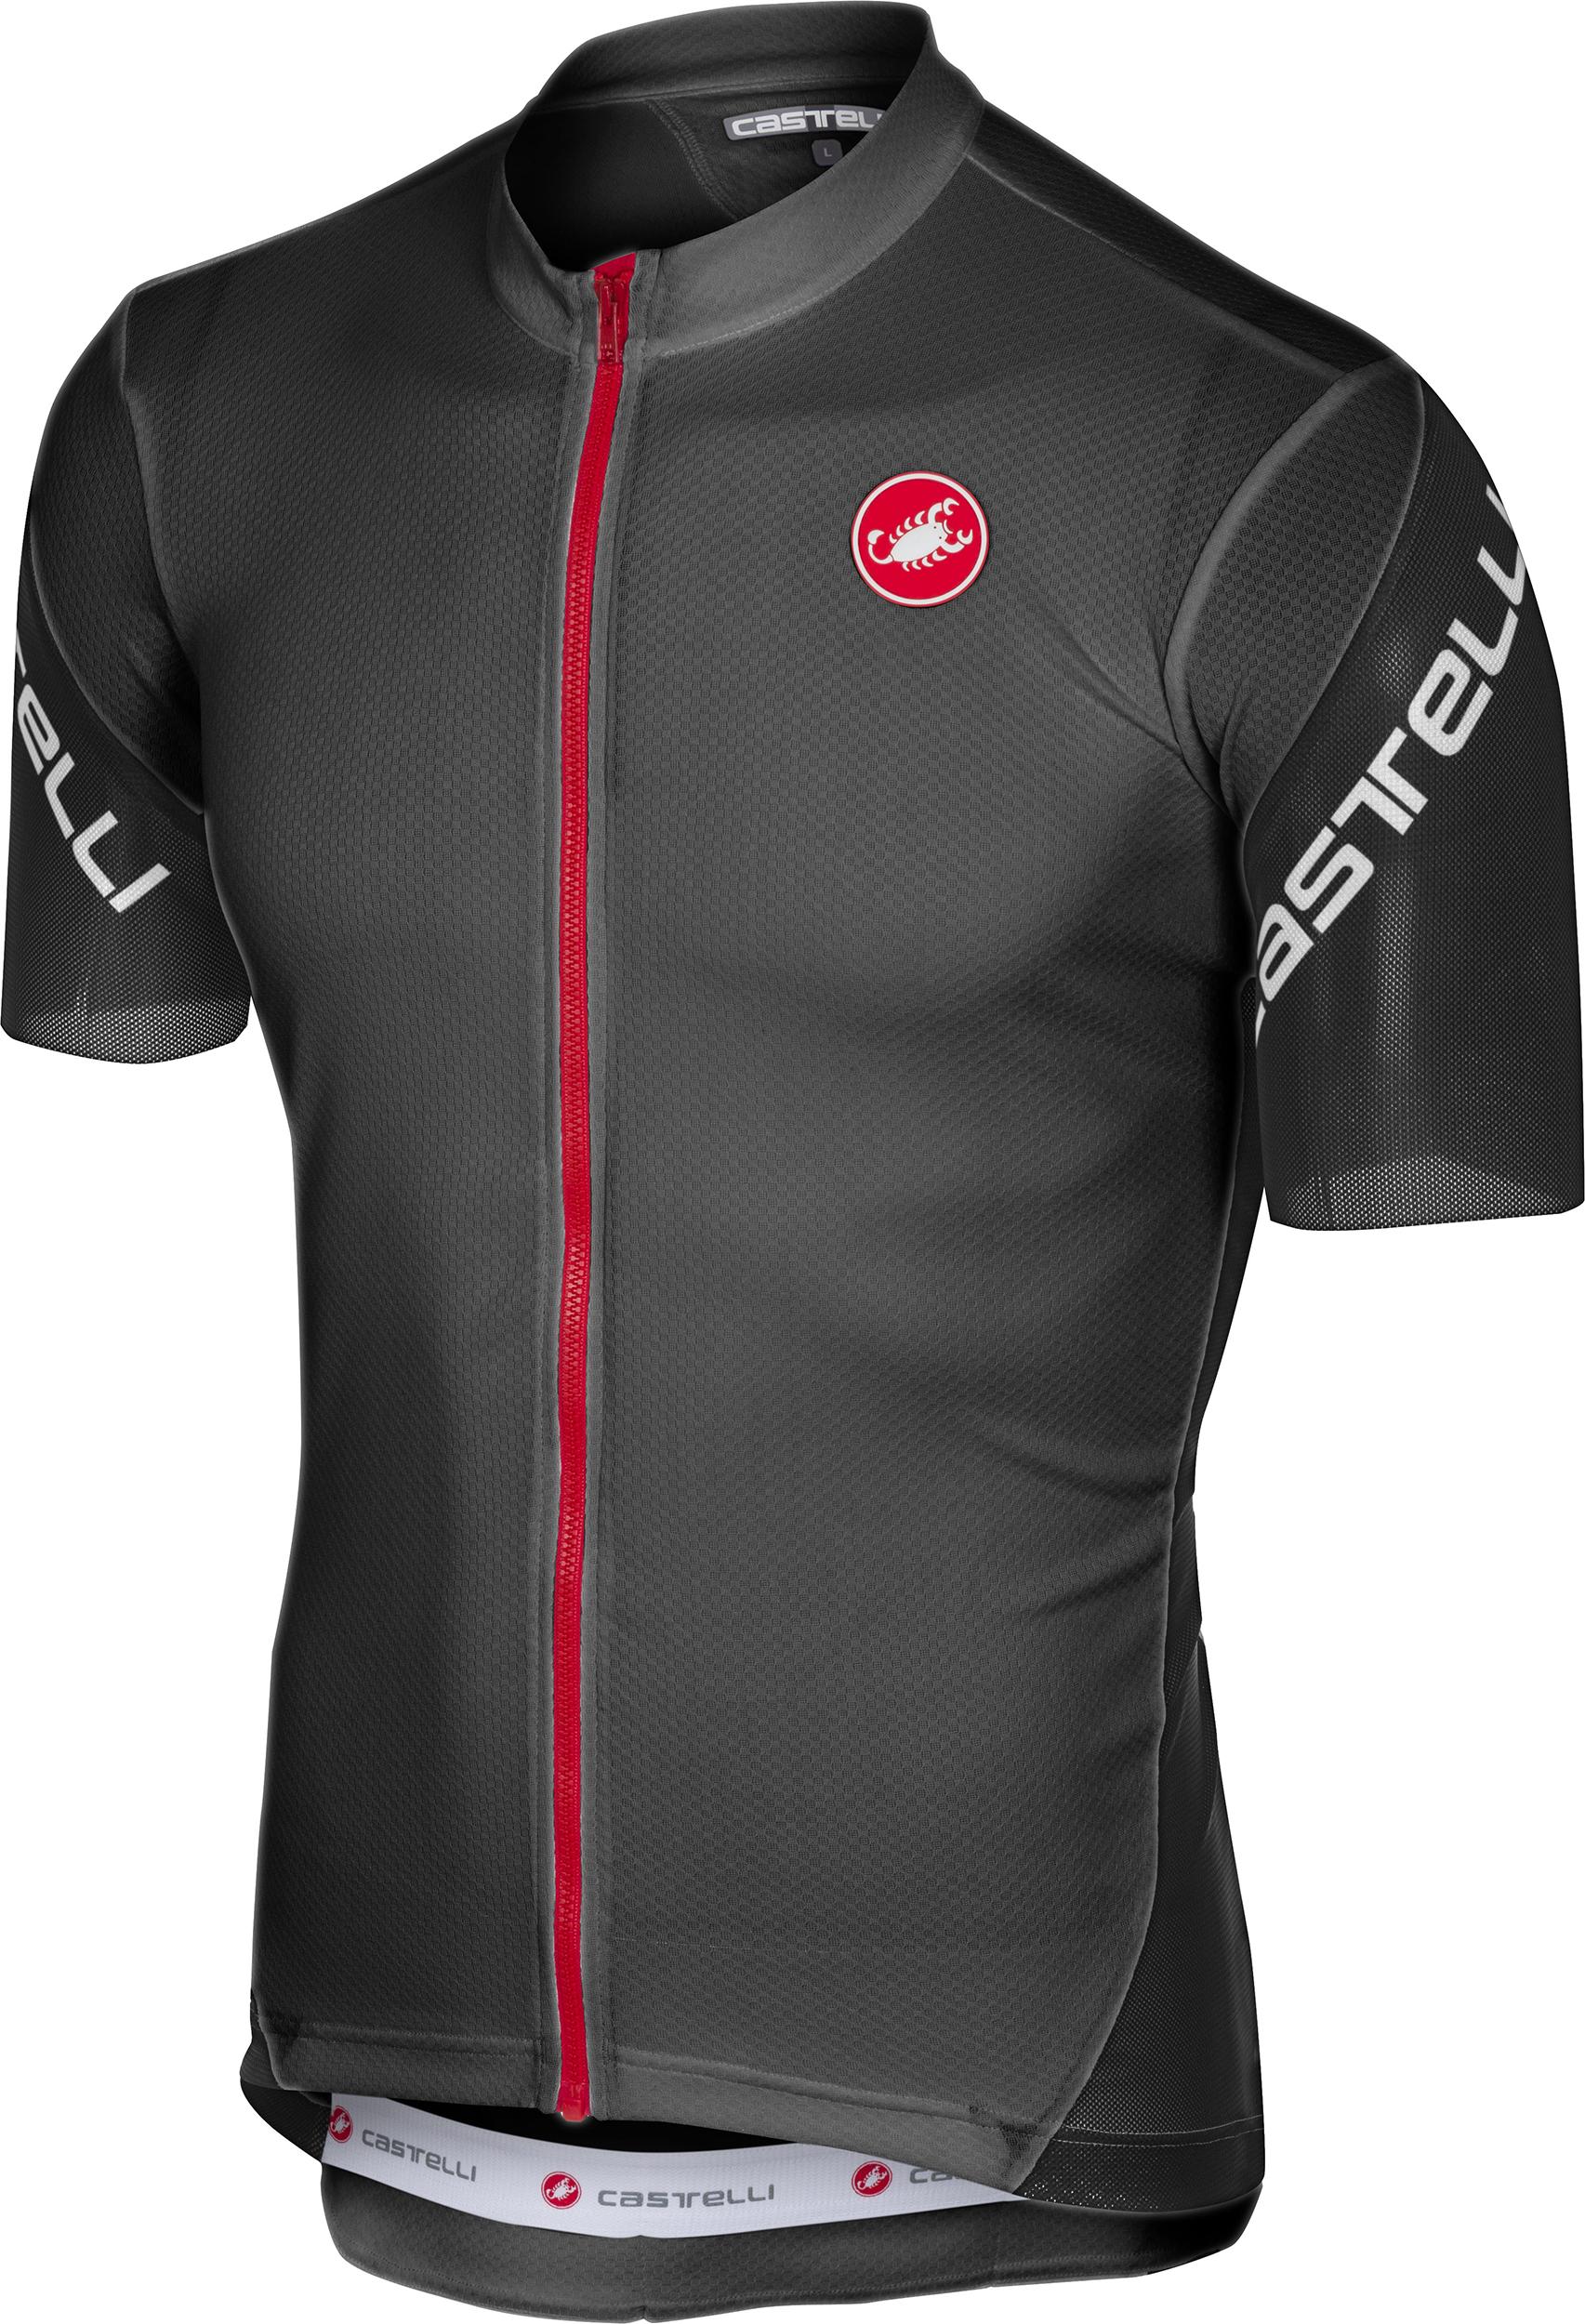 Castelli Cycling jerseys and shirts 0c20f5a5a